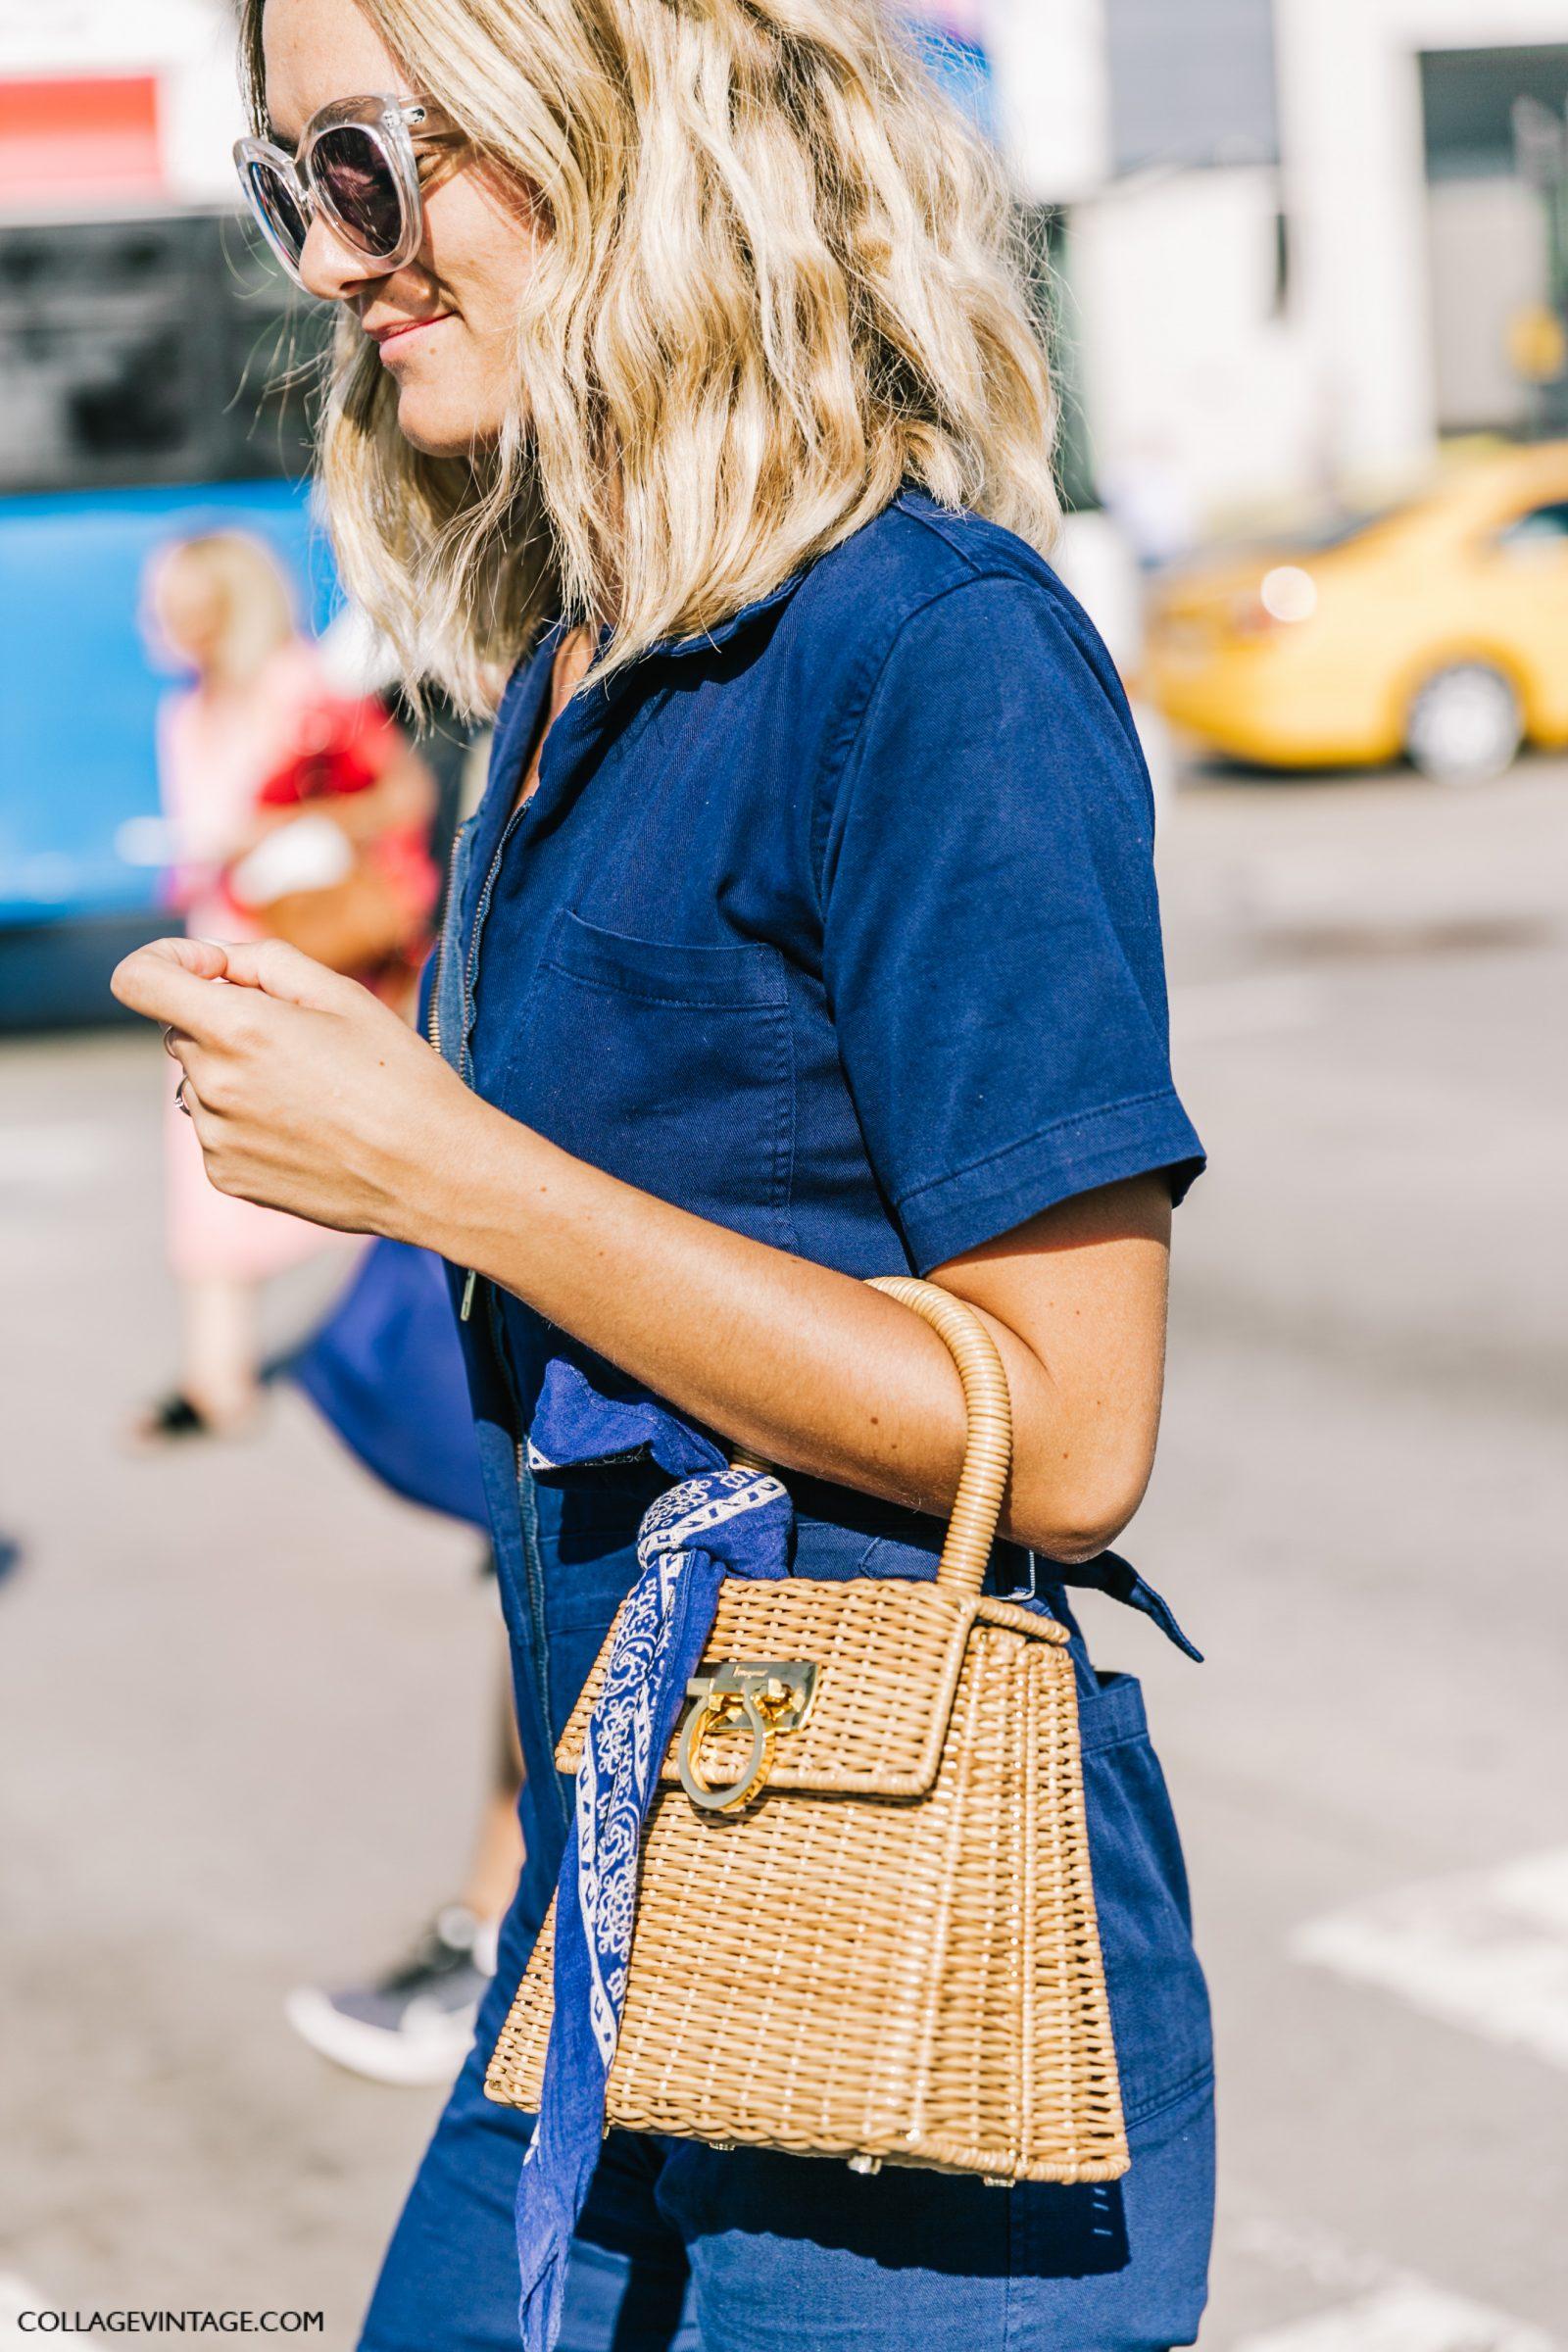 nyfw-new_york_fashion_week_ss17-street_style-outfits-collage_vintage-vintage-mansur_gavriel-rodarte-coach-146